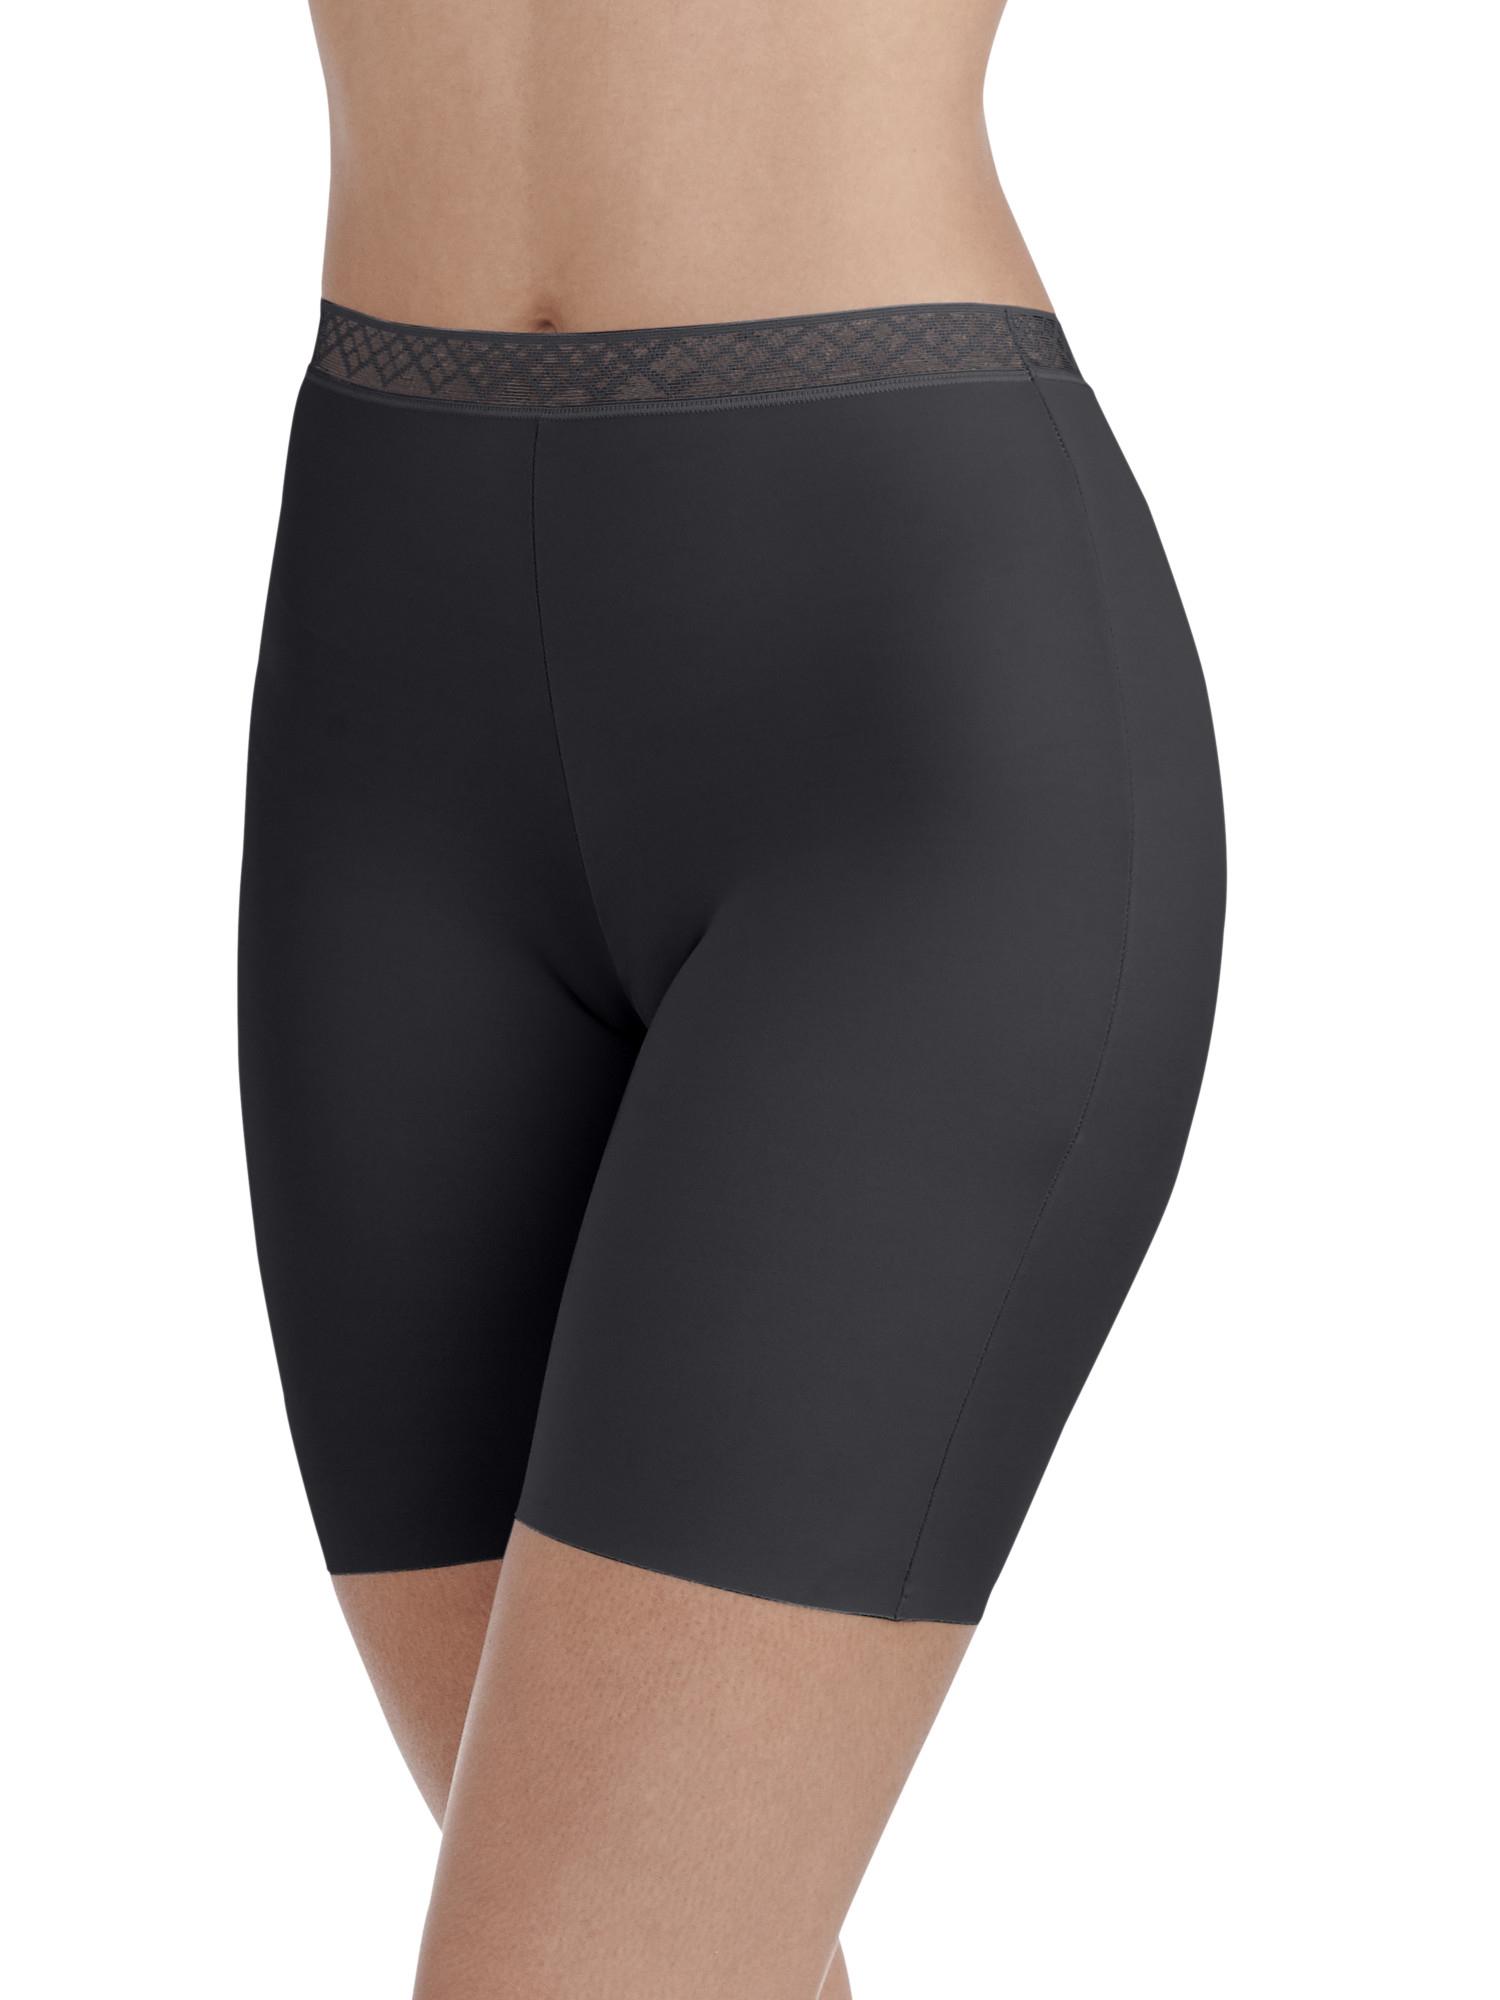 Women's Invisible Edge Smoothing Slip Short, Style 12385